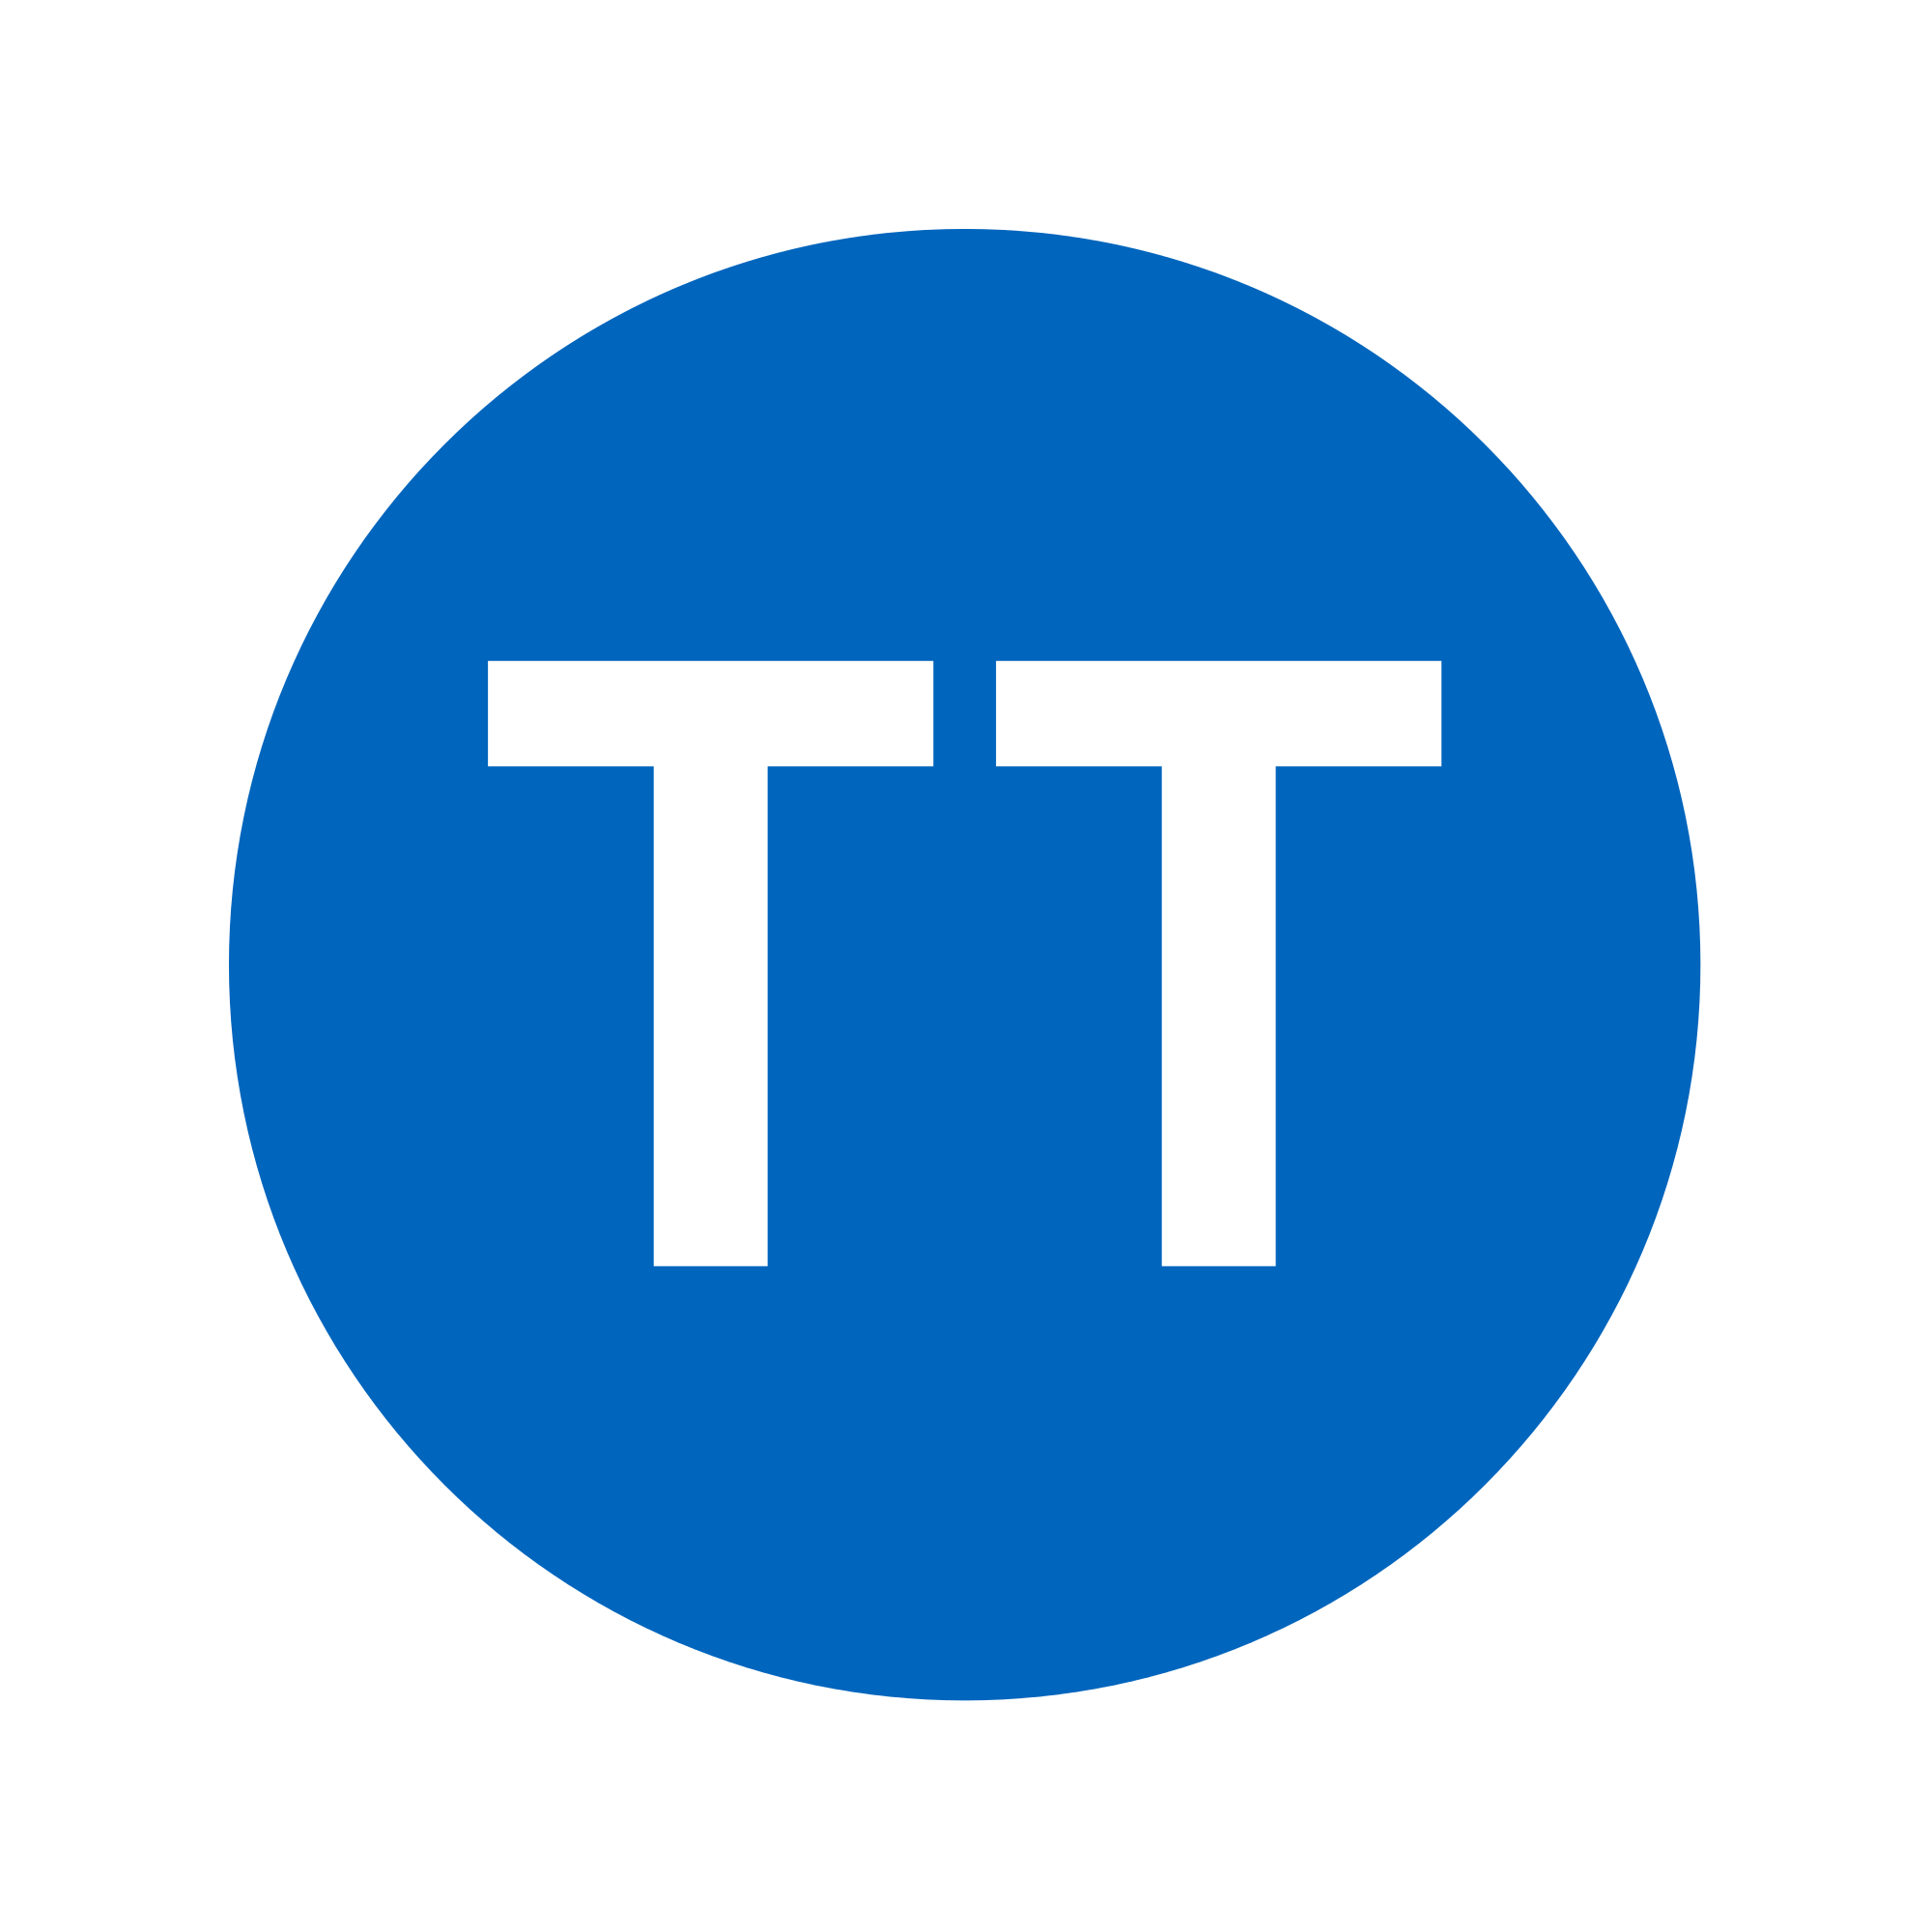 Tt logo png 4 » PNG Image.